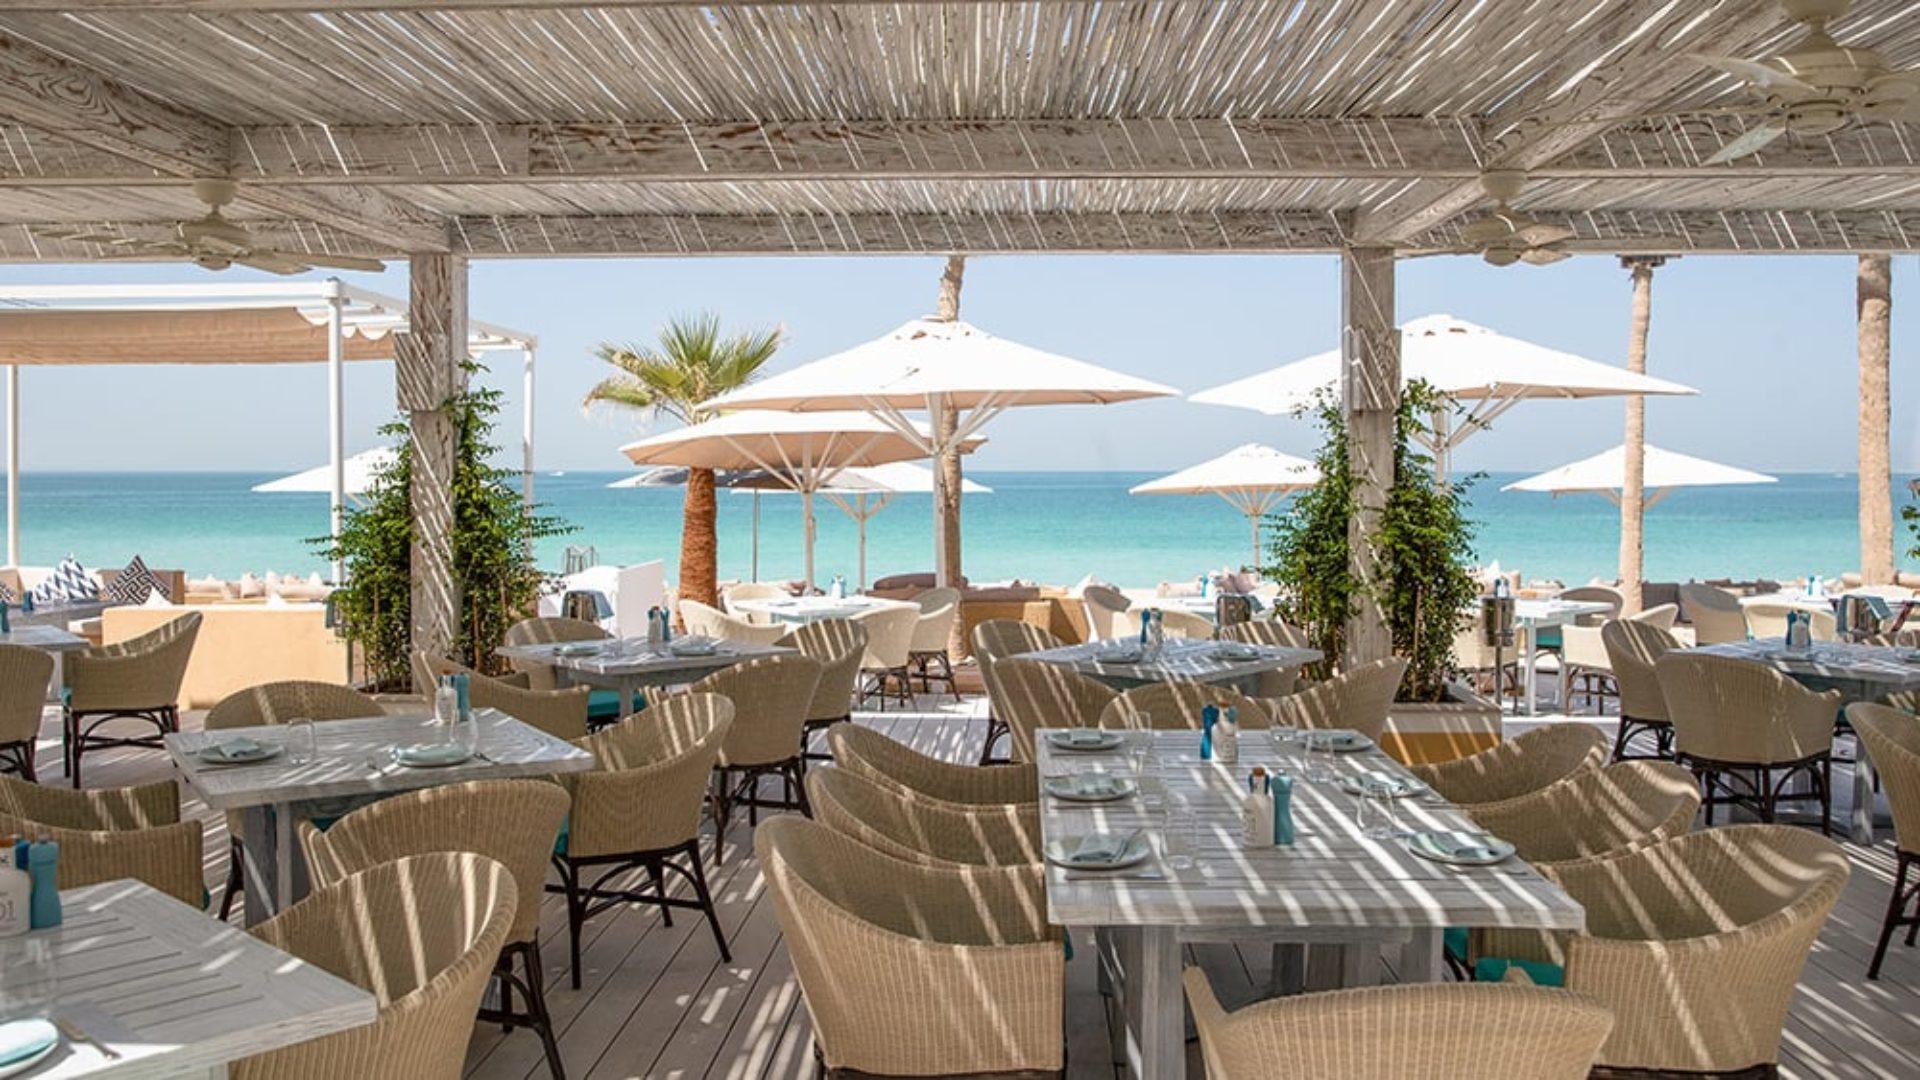 Outdoor terrace dining with beach views at Jumeirah Dar Al Masyaf